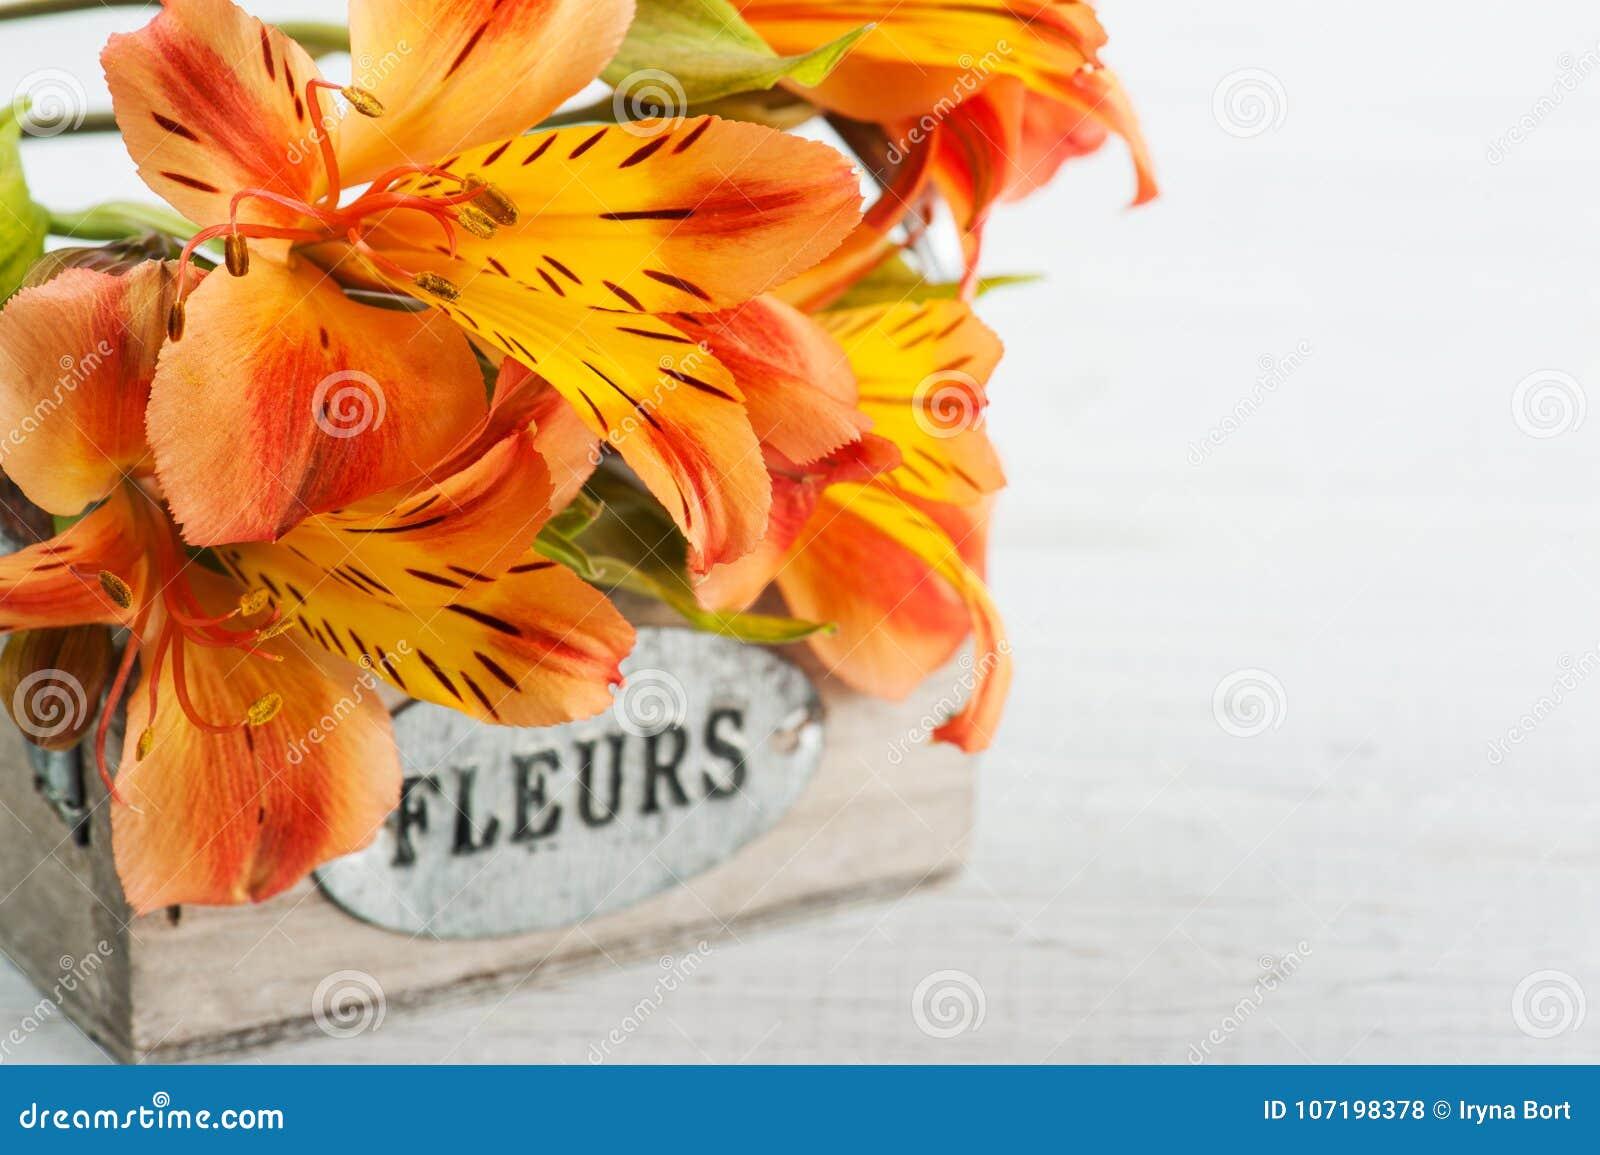 Arrangement of orange lily flowers in wooden box stock photo image arrangement of orange lily flowers in wooden box izmirmasajfo